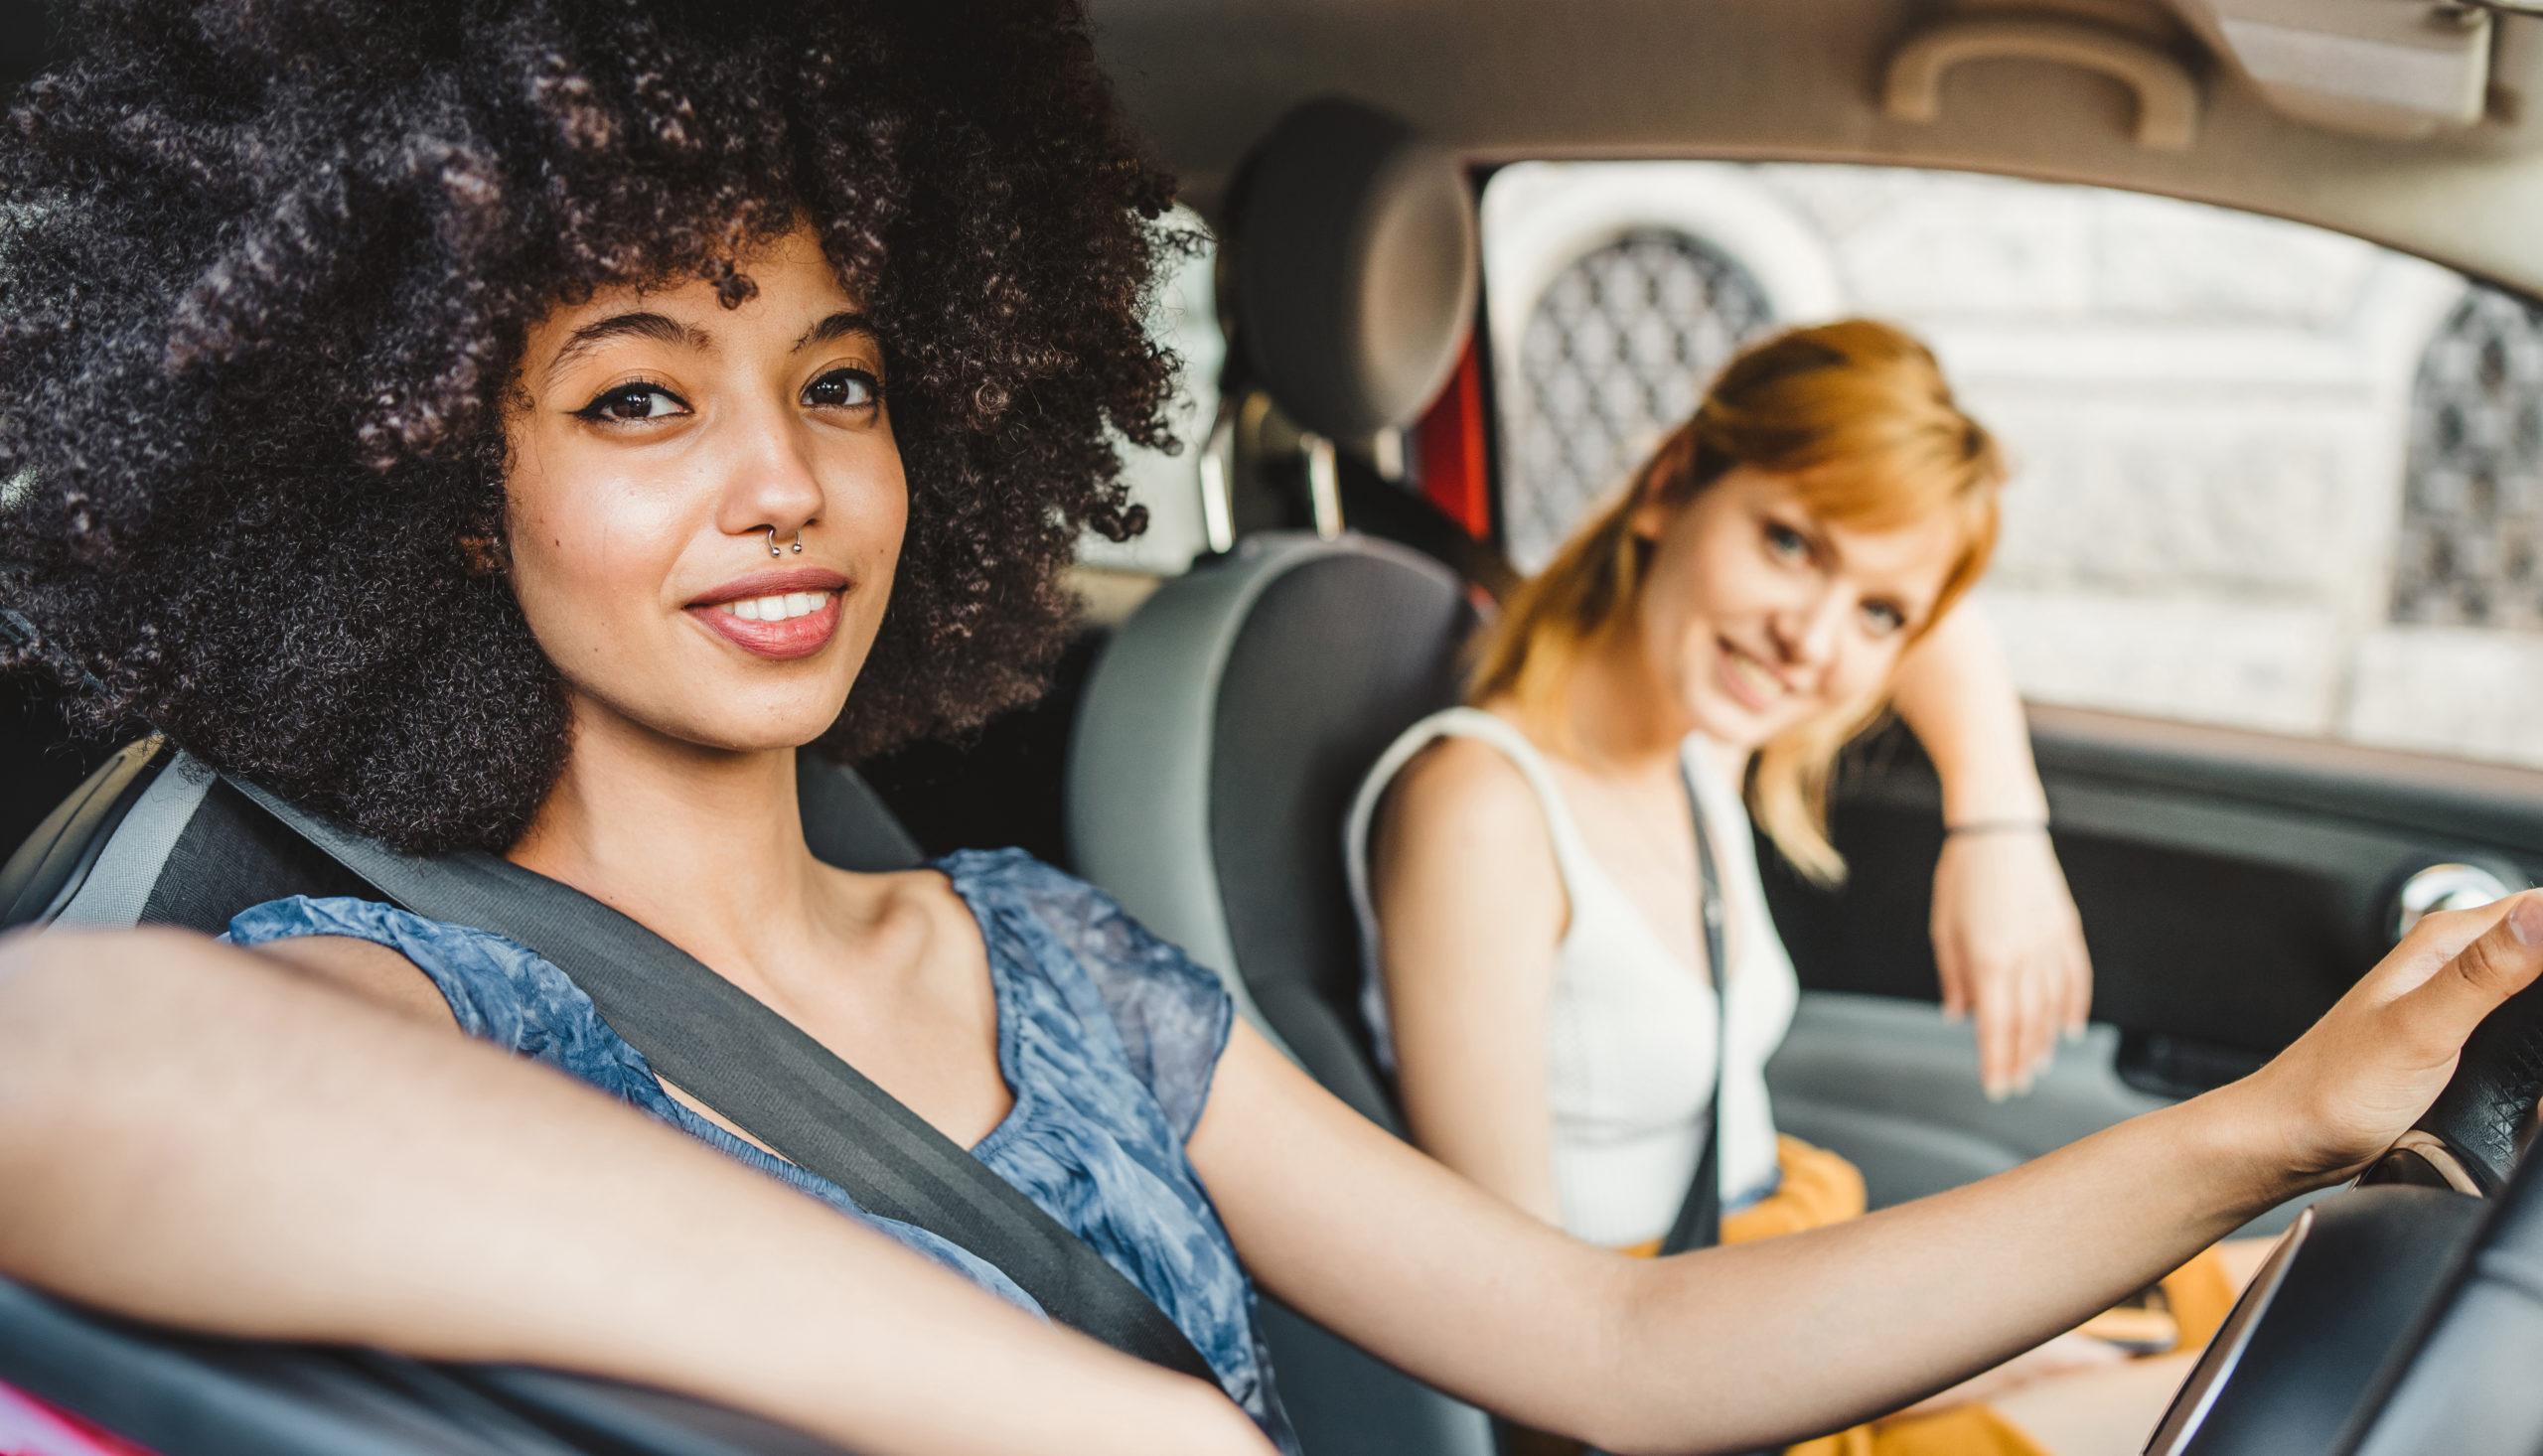 Learner Driver Smiling with Supervisor